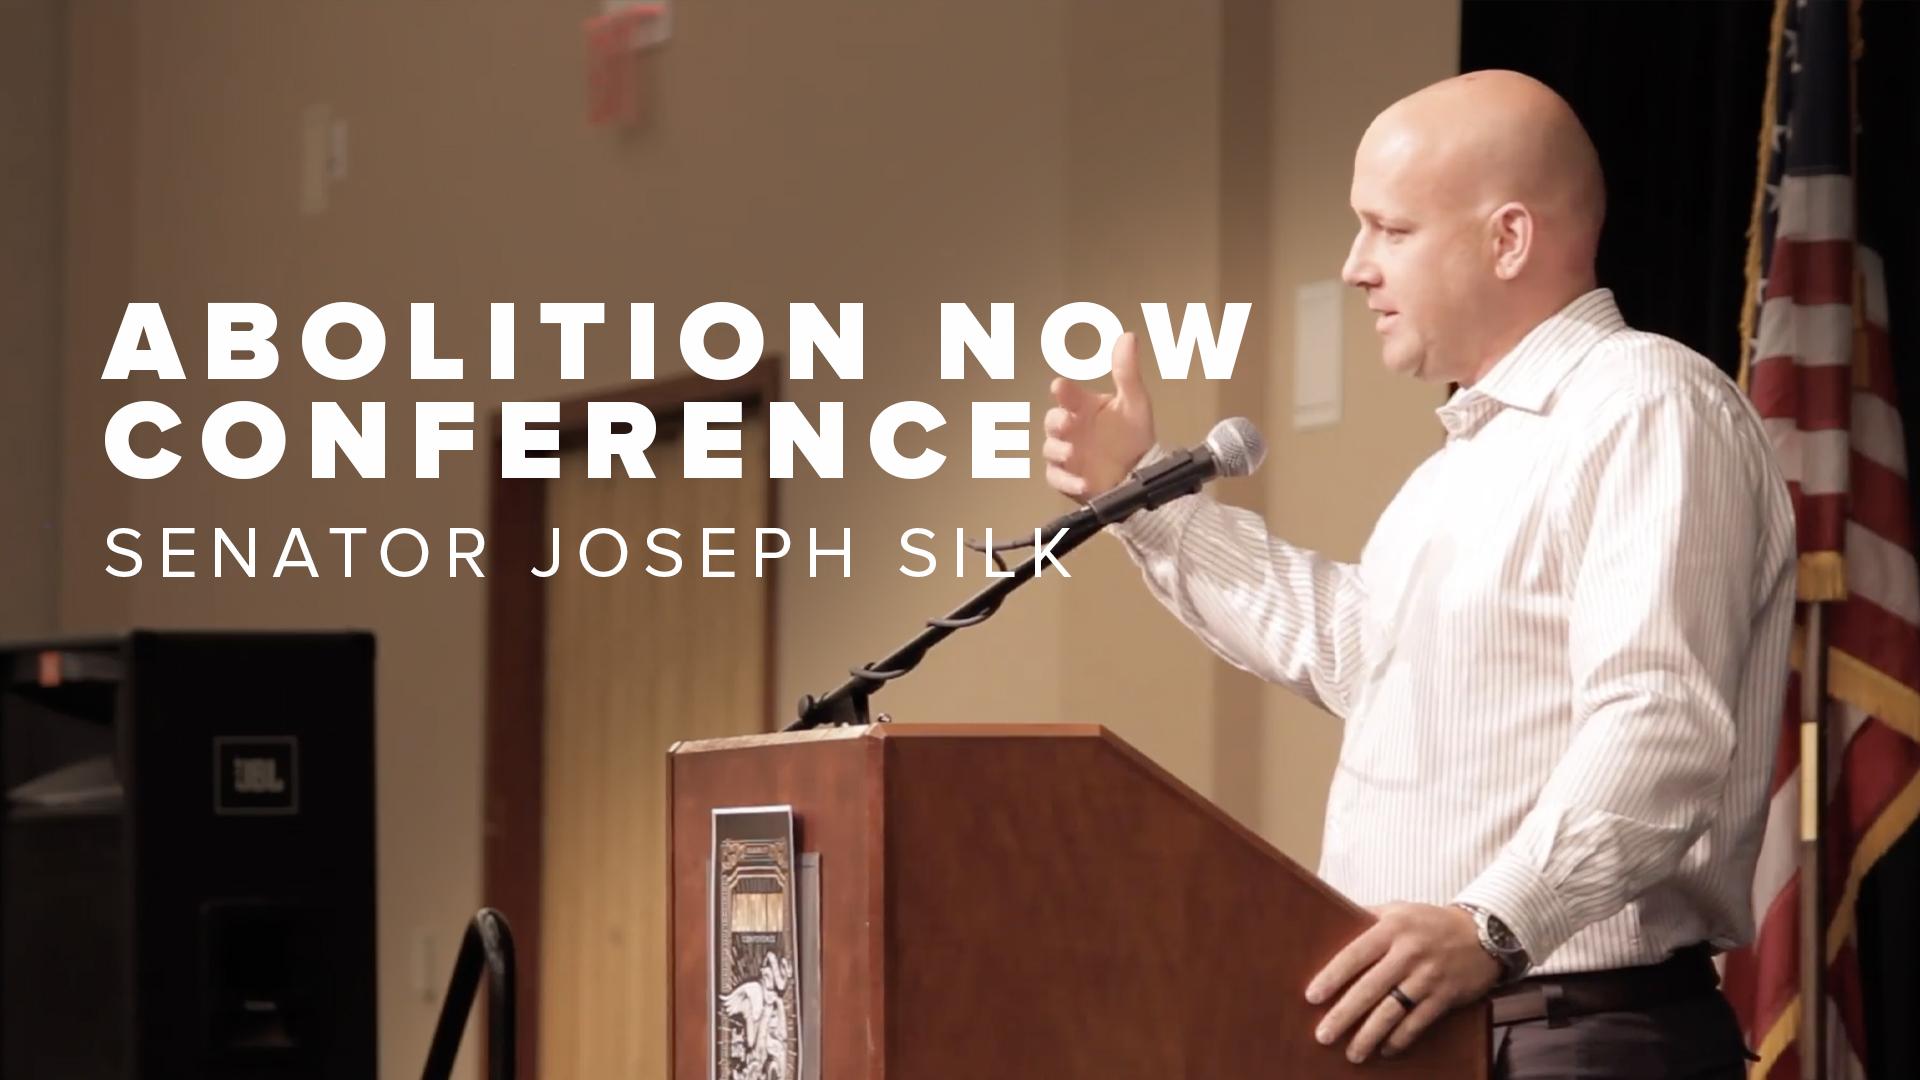 Abolition Now Conference Senator Joseph Silk